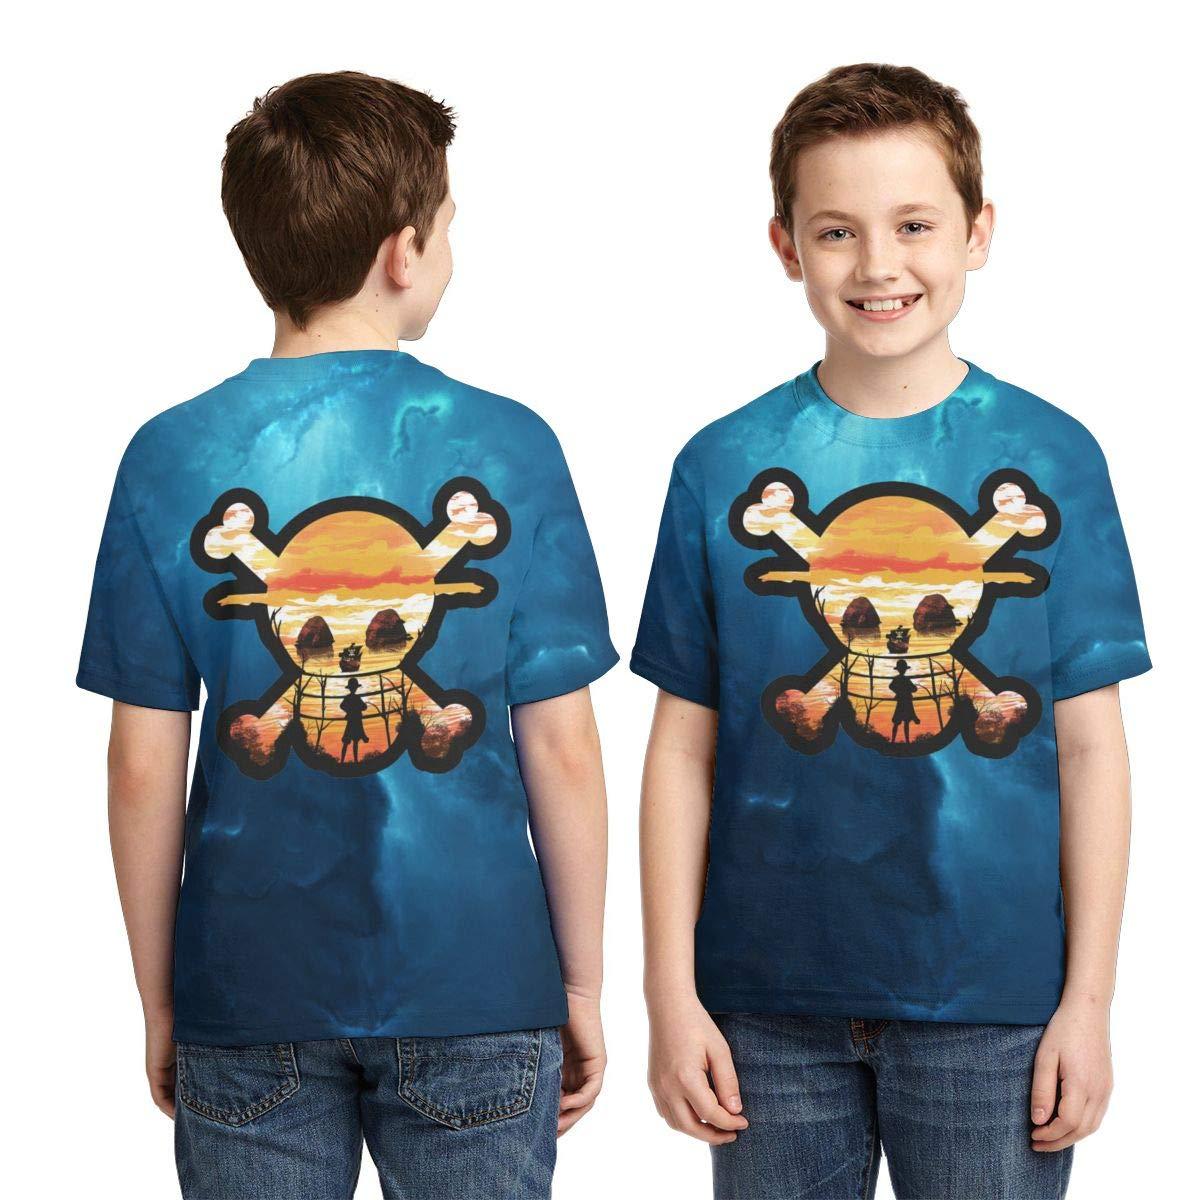 Zengqinglove Boys,Girls,Youth Vintage One Piece Anime Tee Shirt